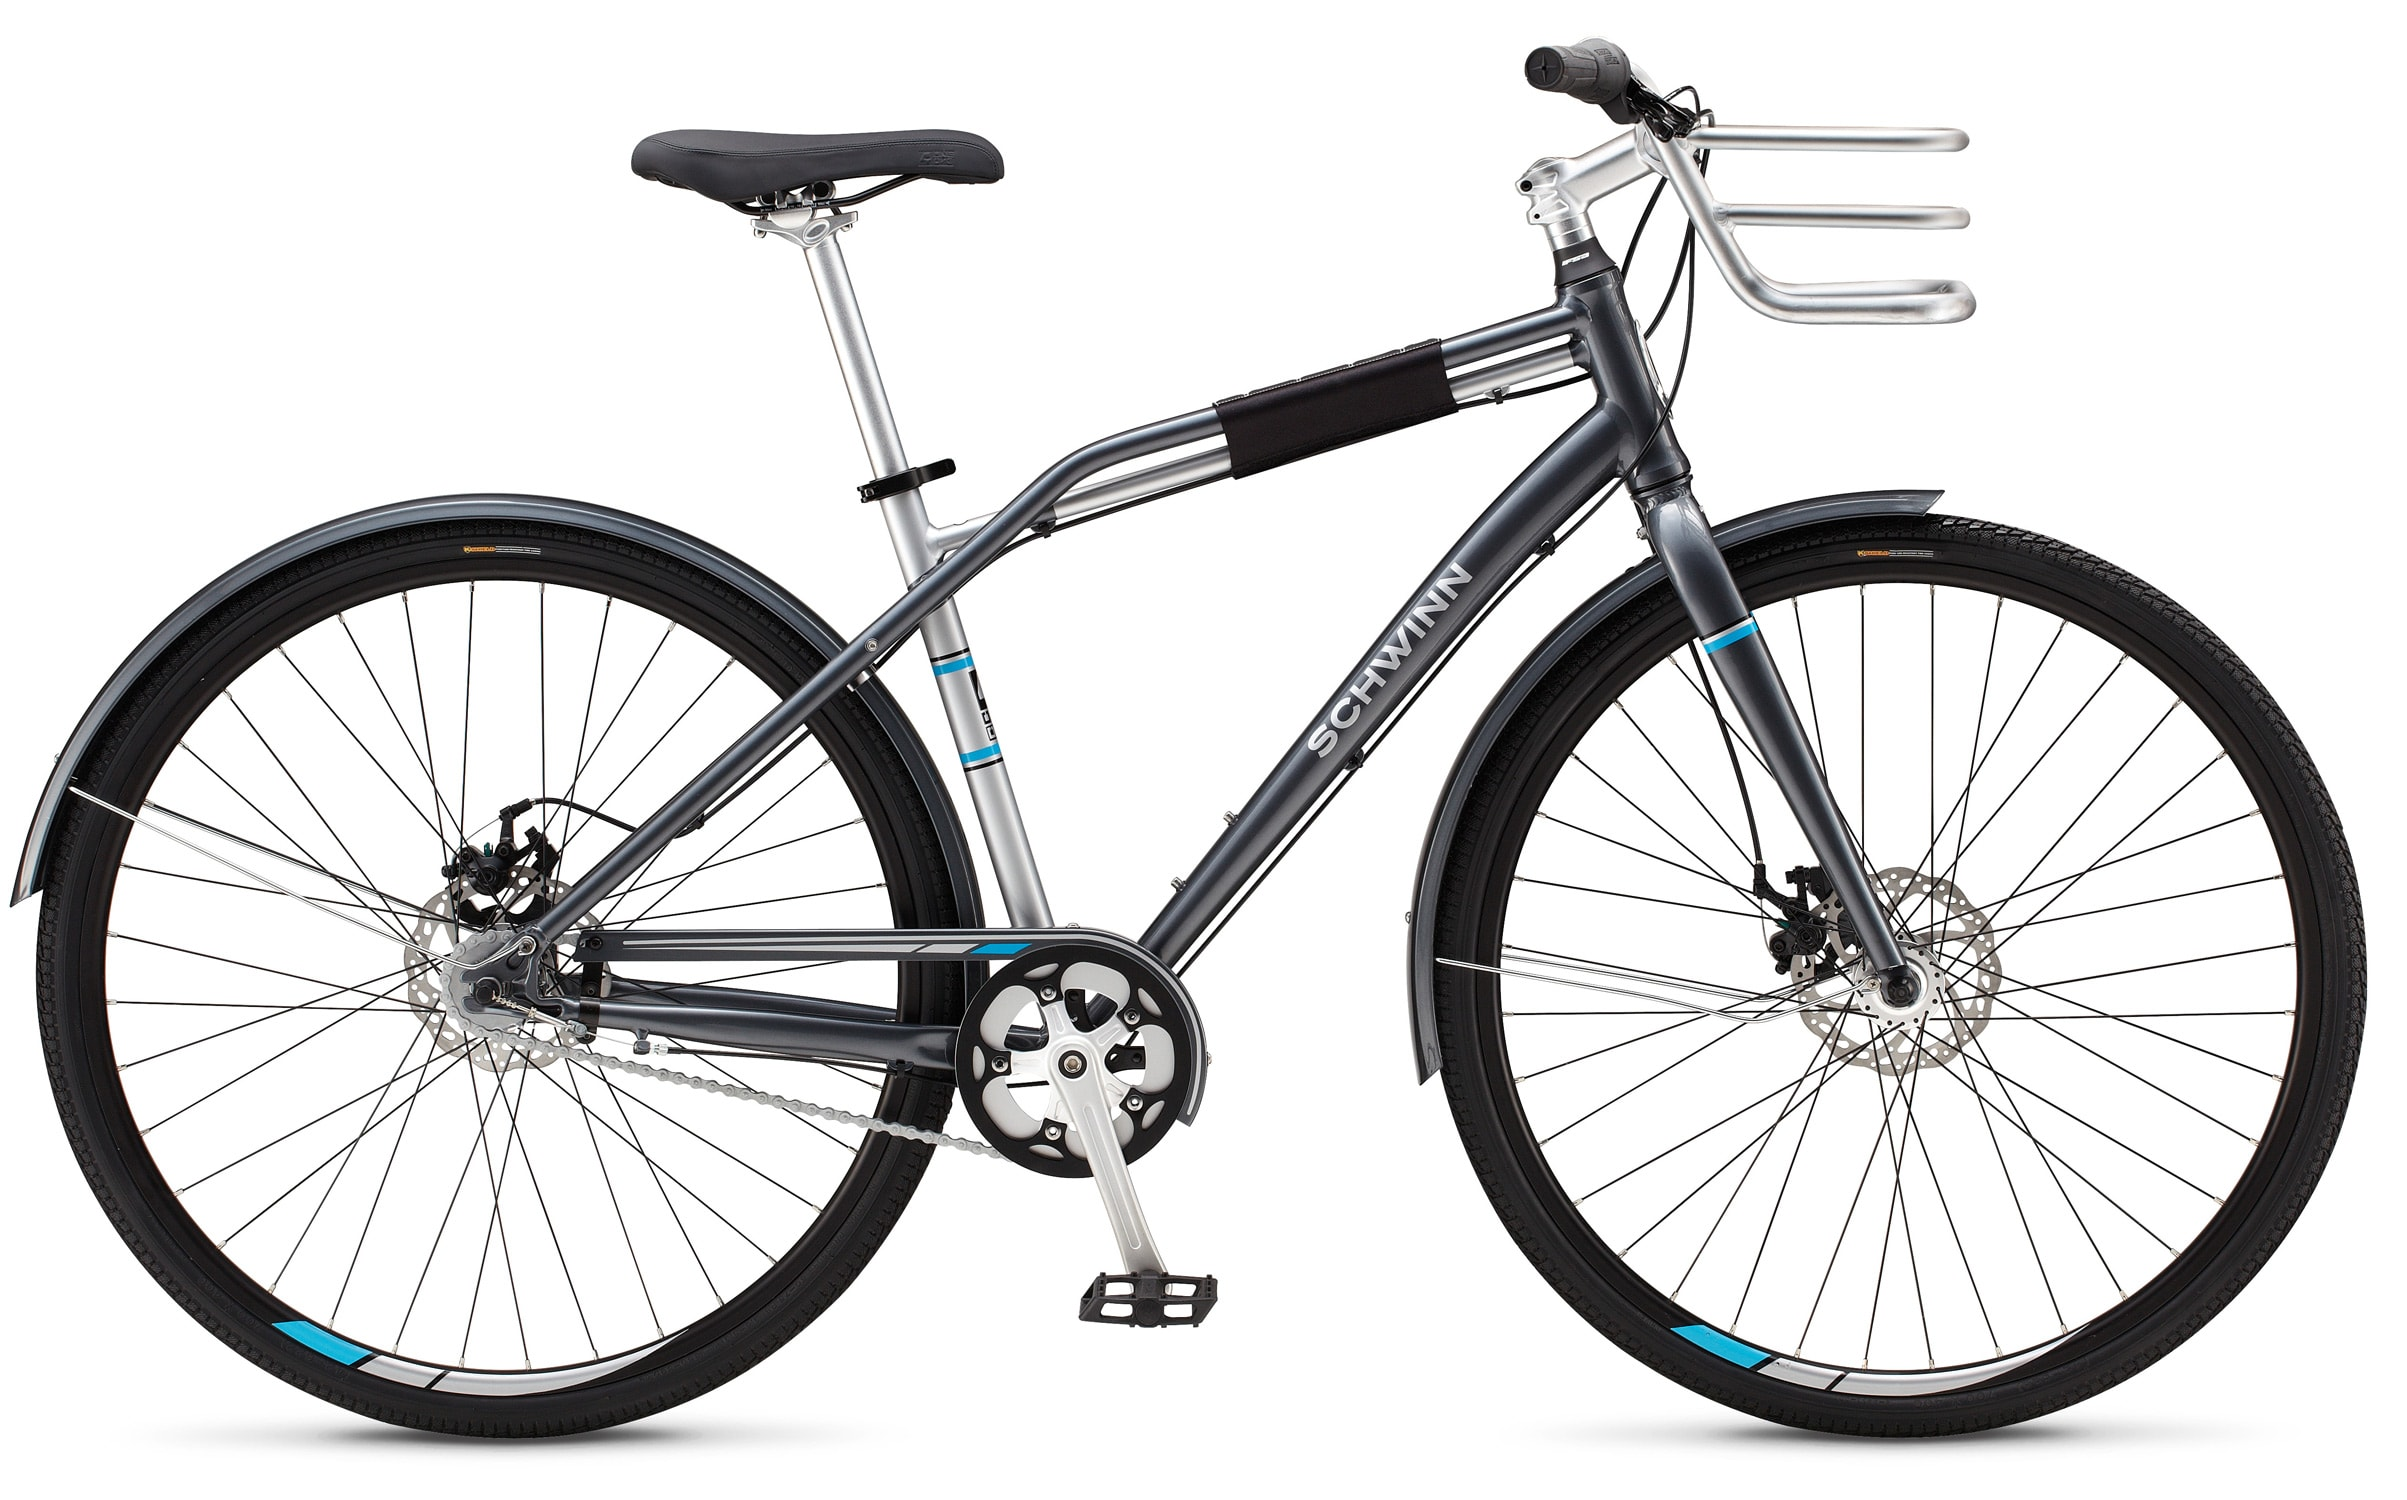 c76ffc67a8f Schwinn 411-1 Bike - thumbnail 1